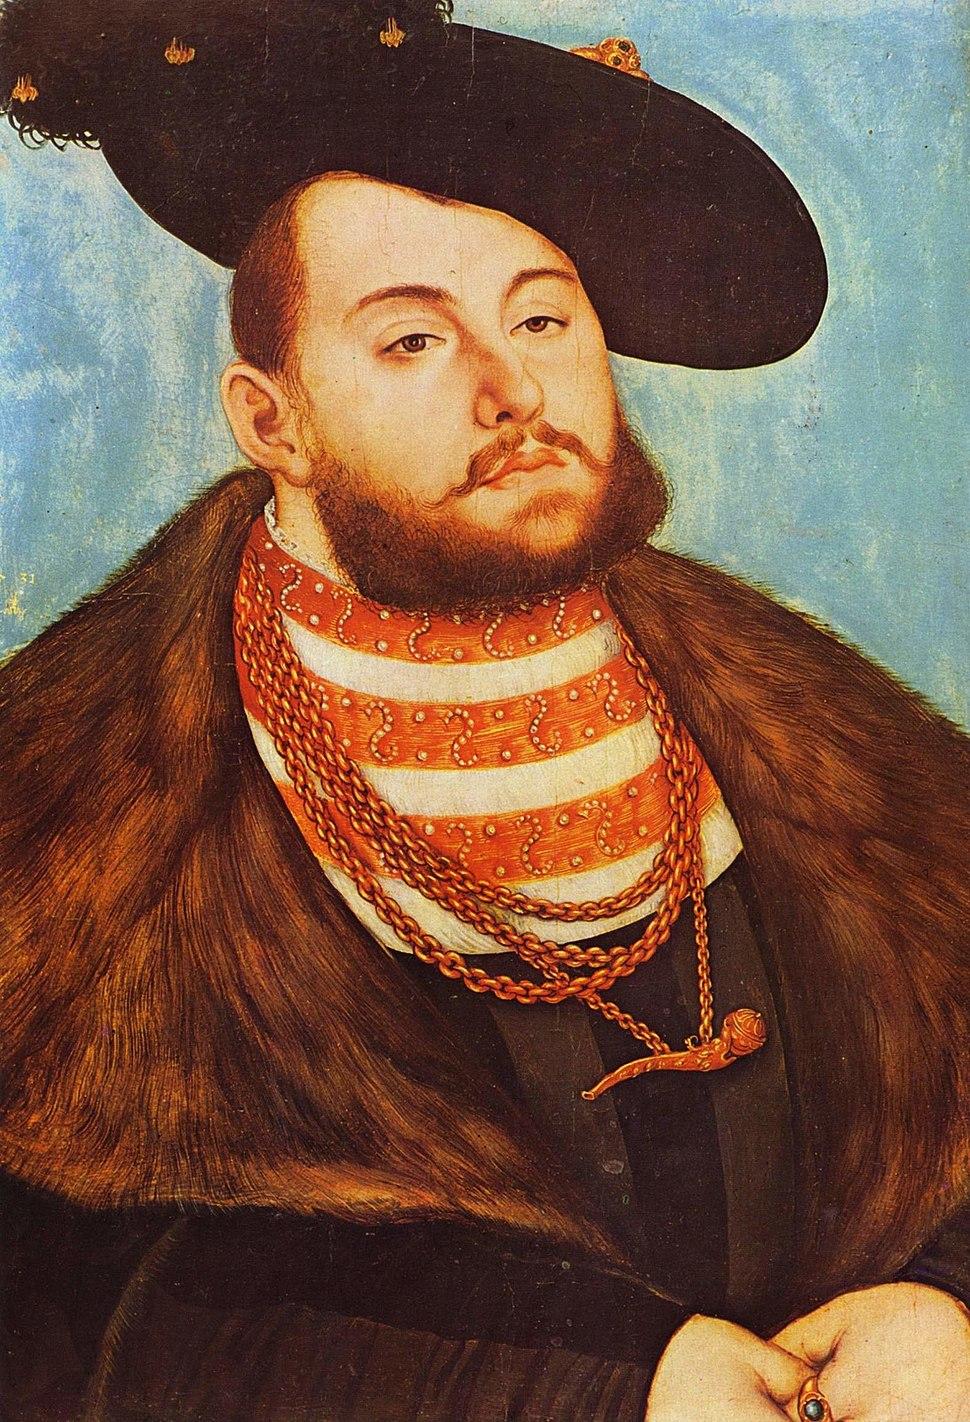 Lucas Cranach d. %C3%84. 044